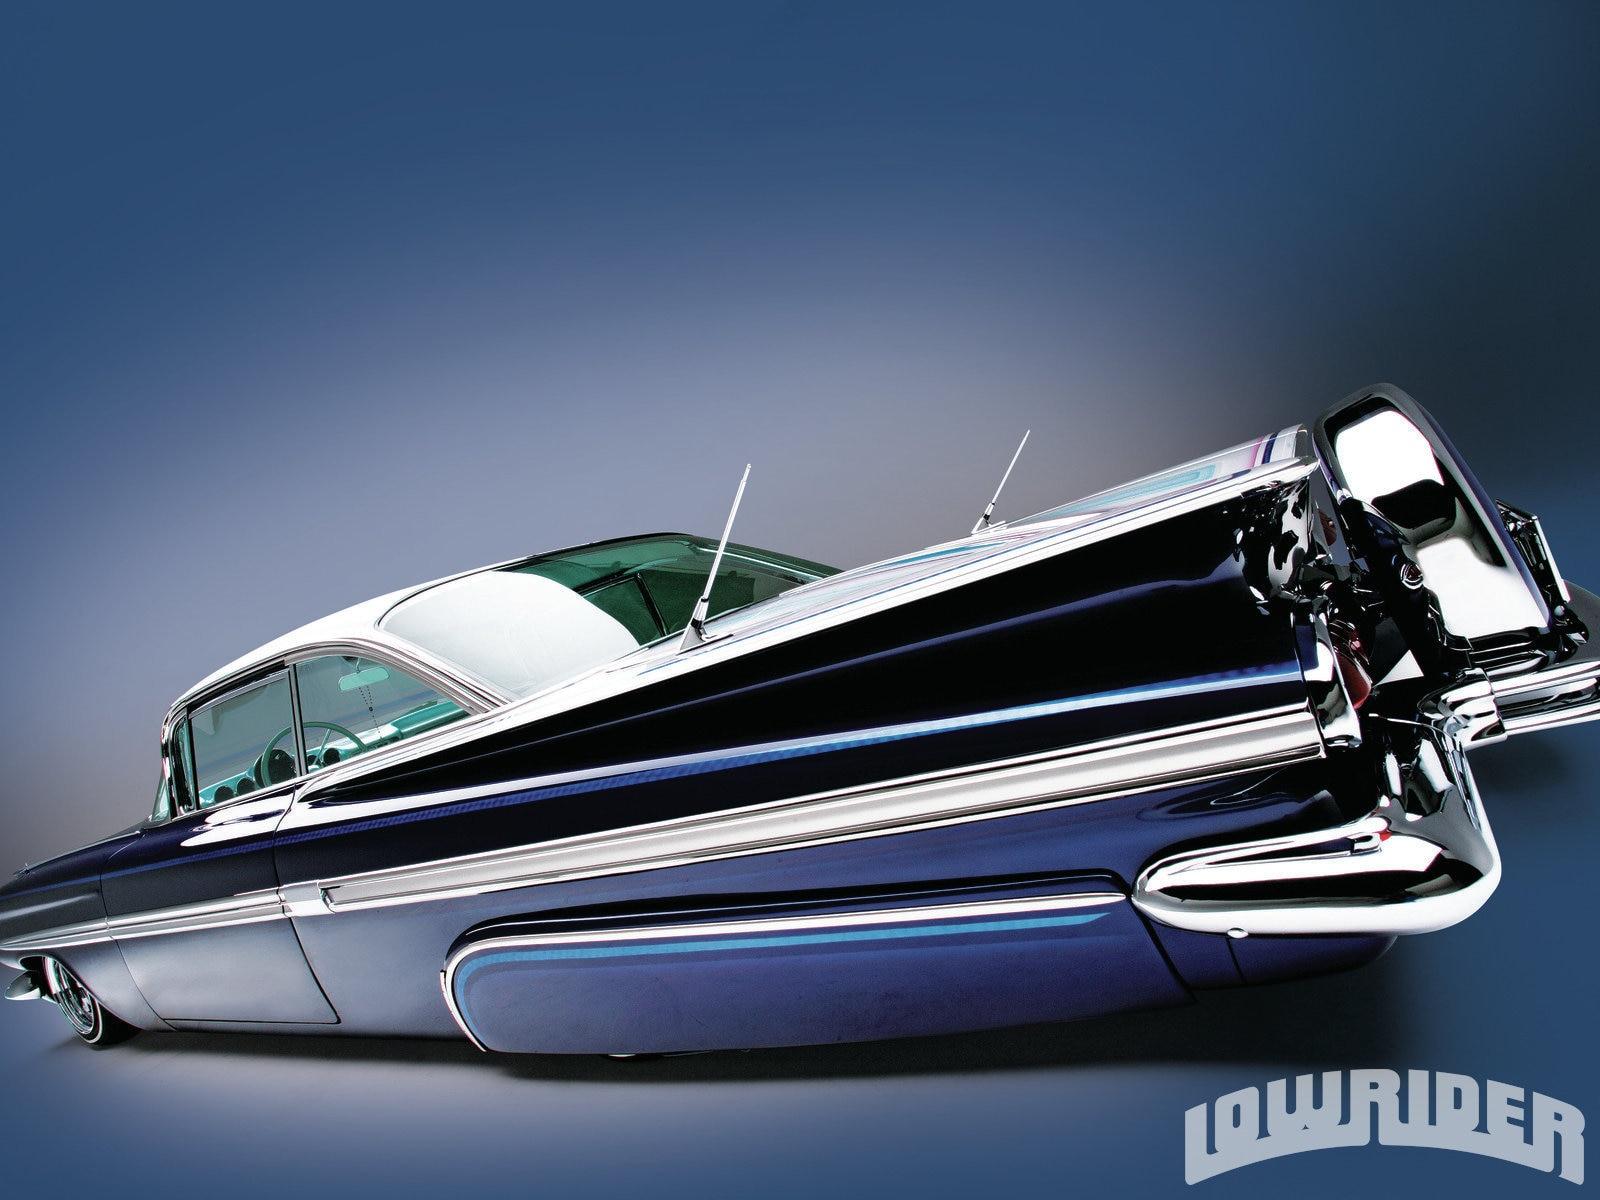 1959 Chevrolet Impala - Lowrider Magazine